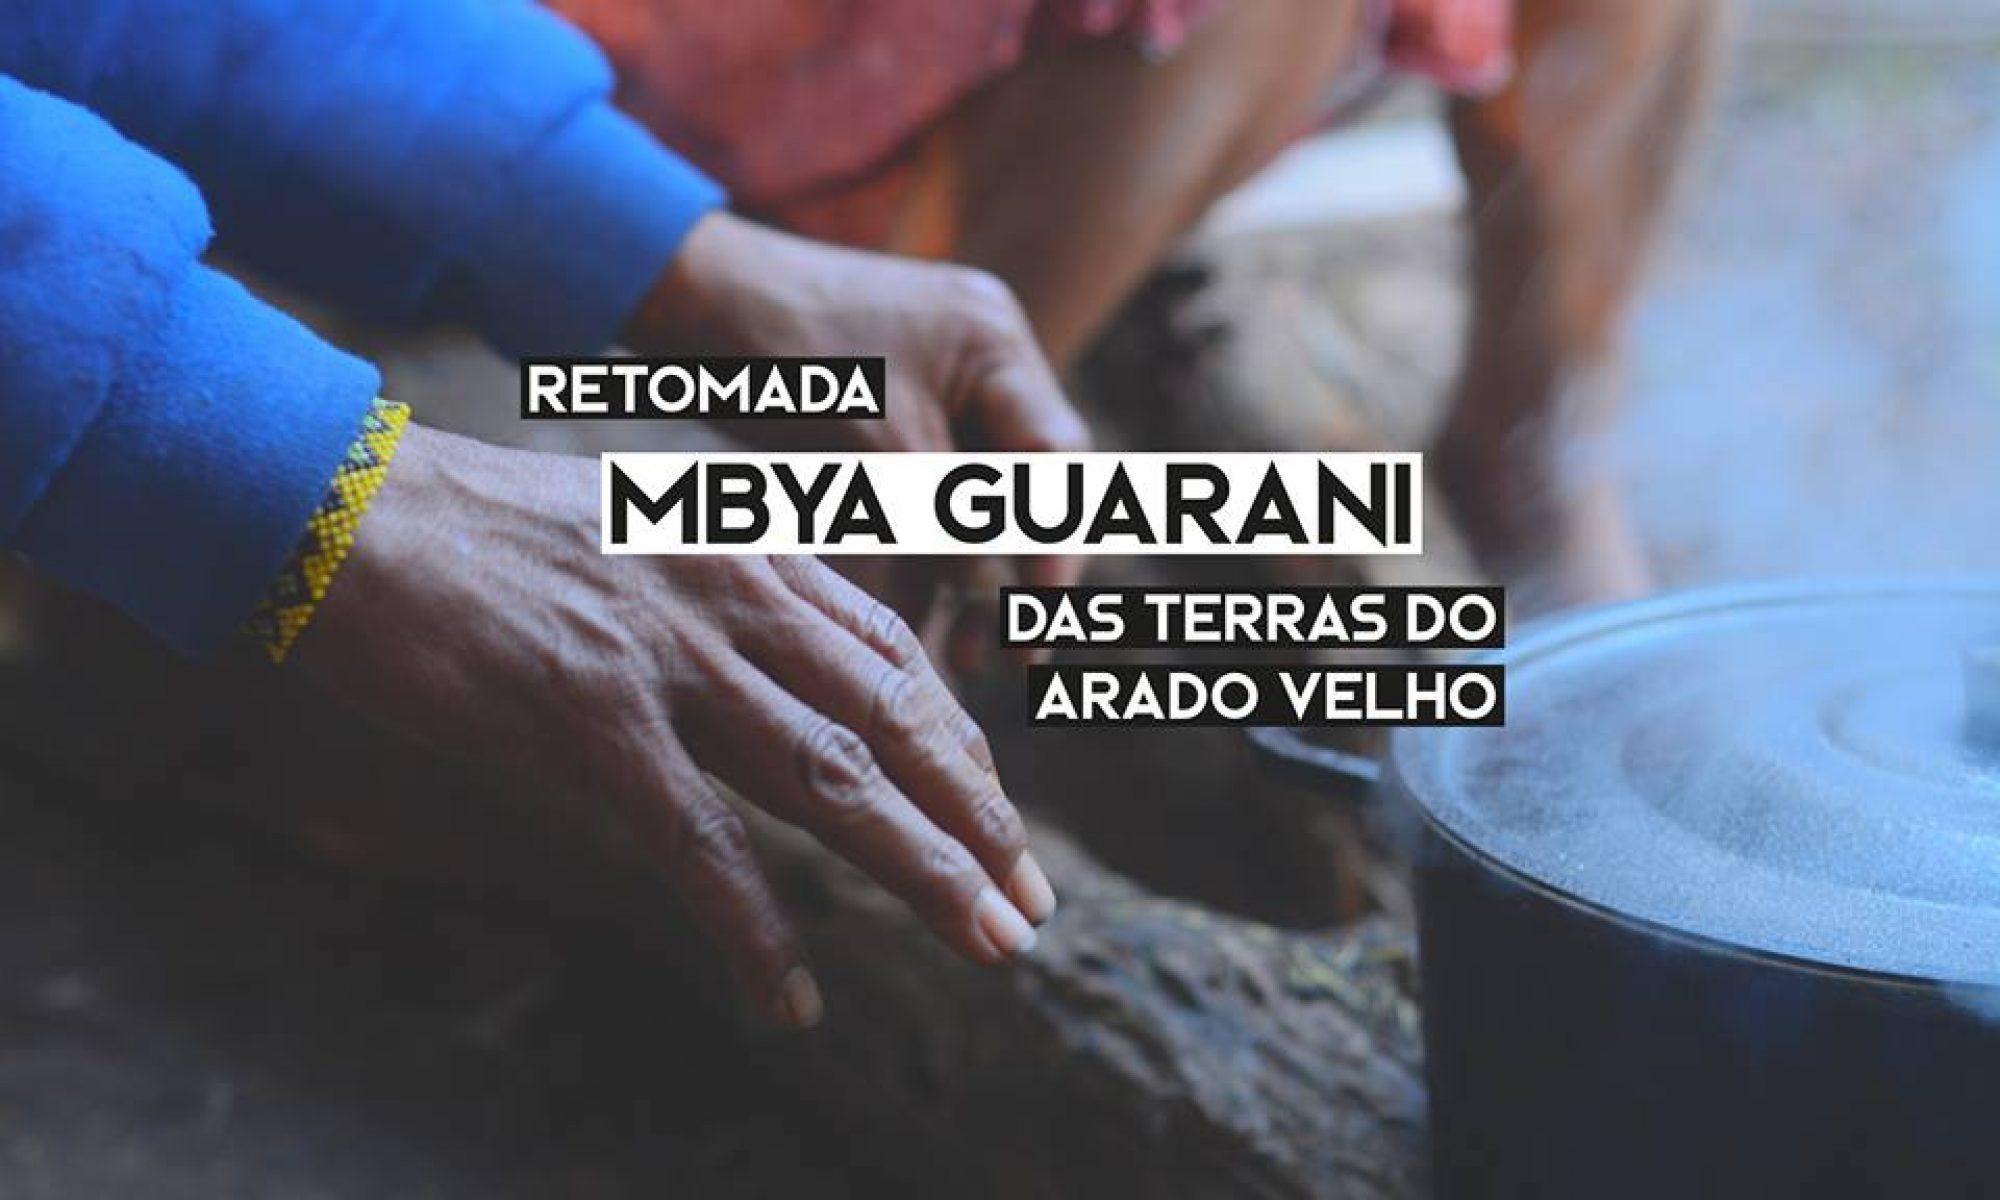 Retomada Mbya Guarani - Ponta do Arado Velho